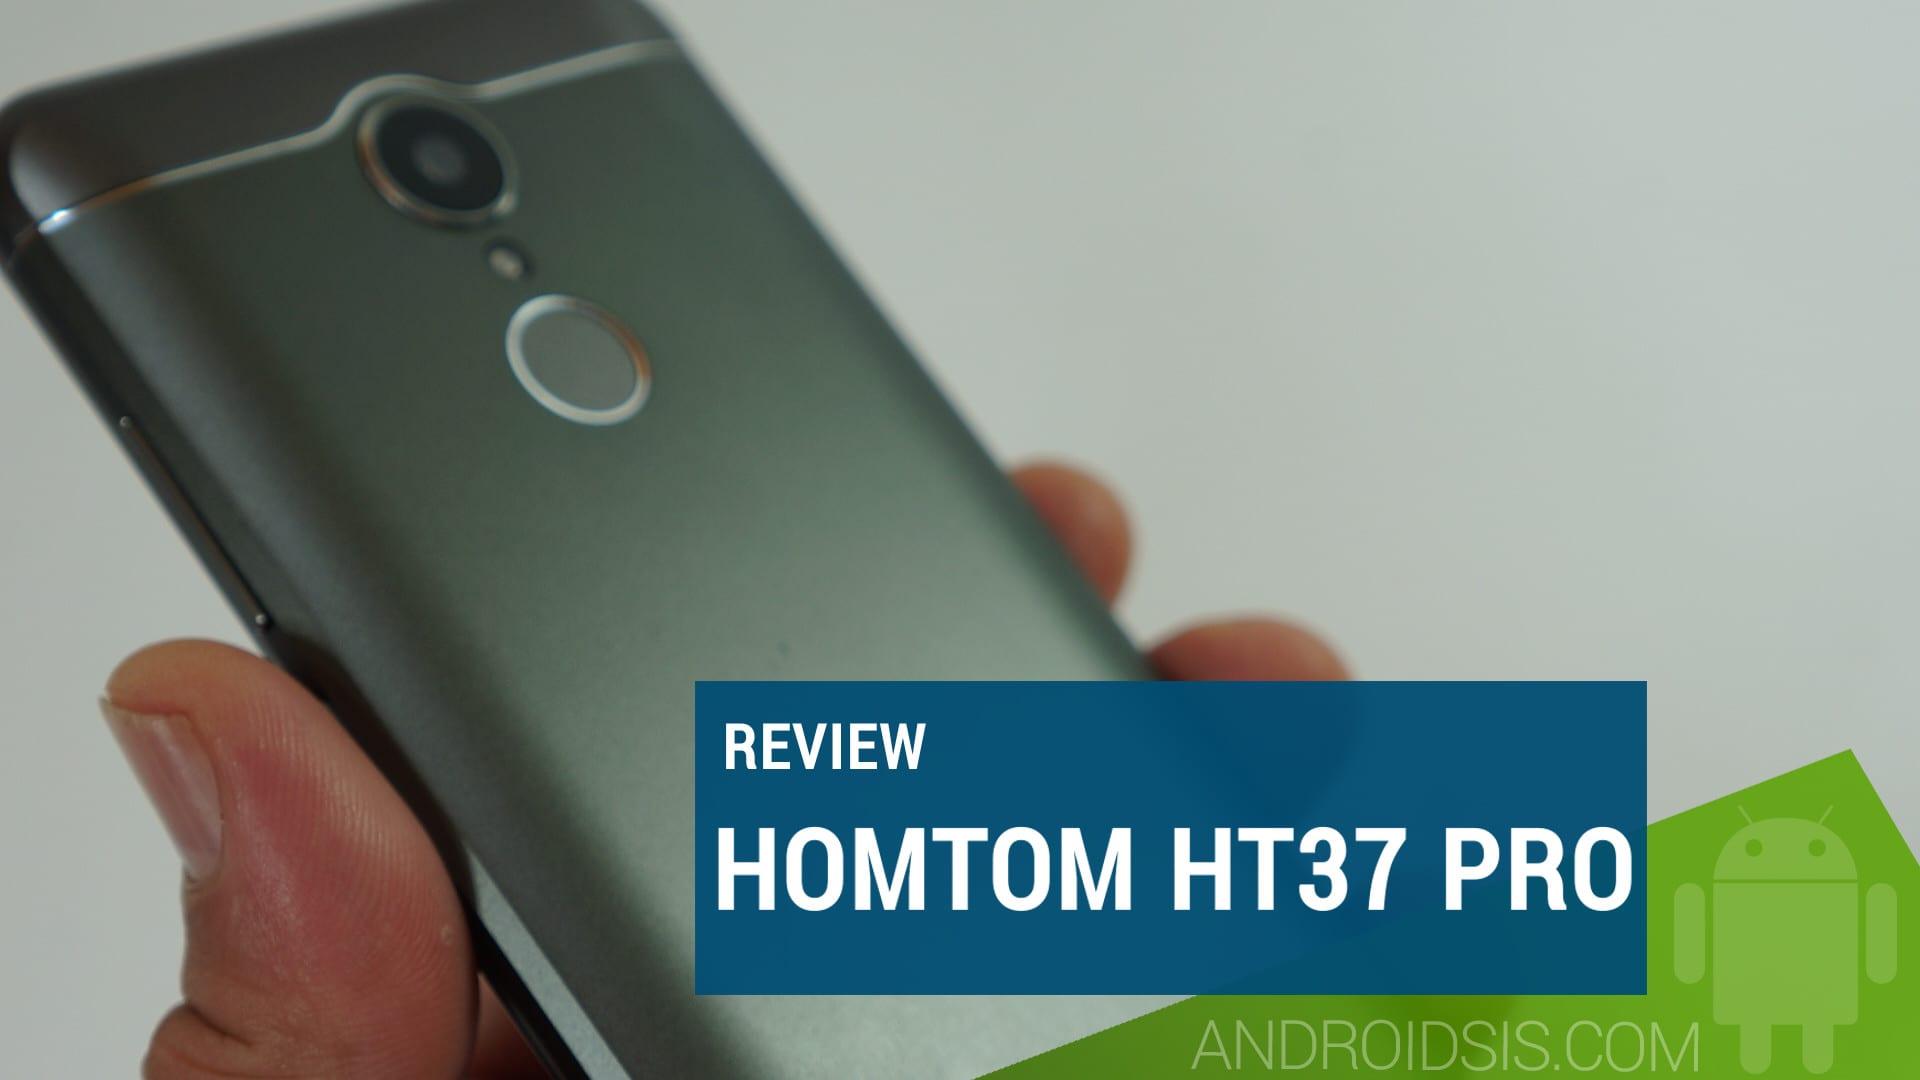 Review Homtom HT37 PRO, ¡no te vas a creer lo que ofrece por menos de 80 Euros!